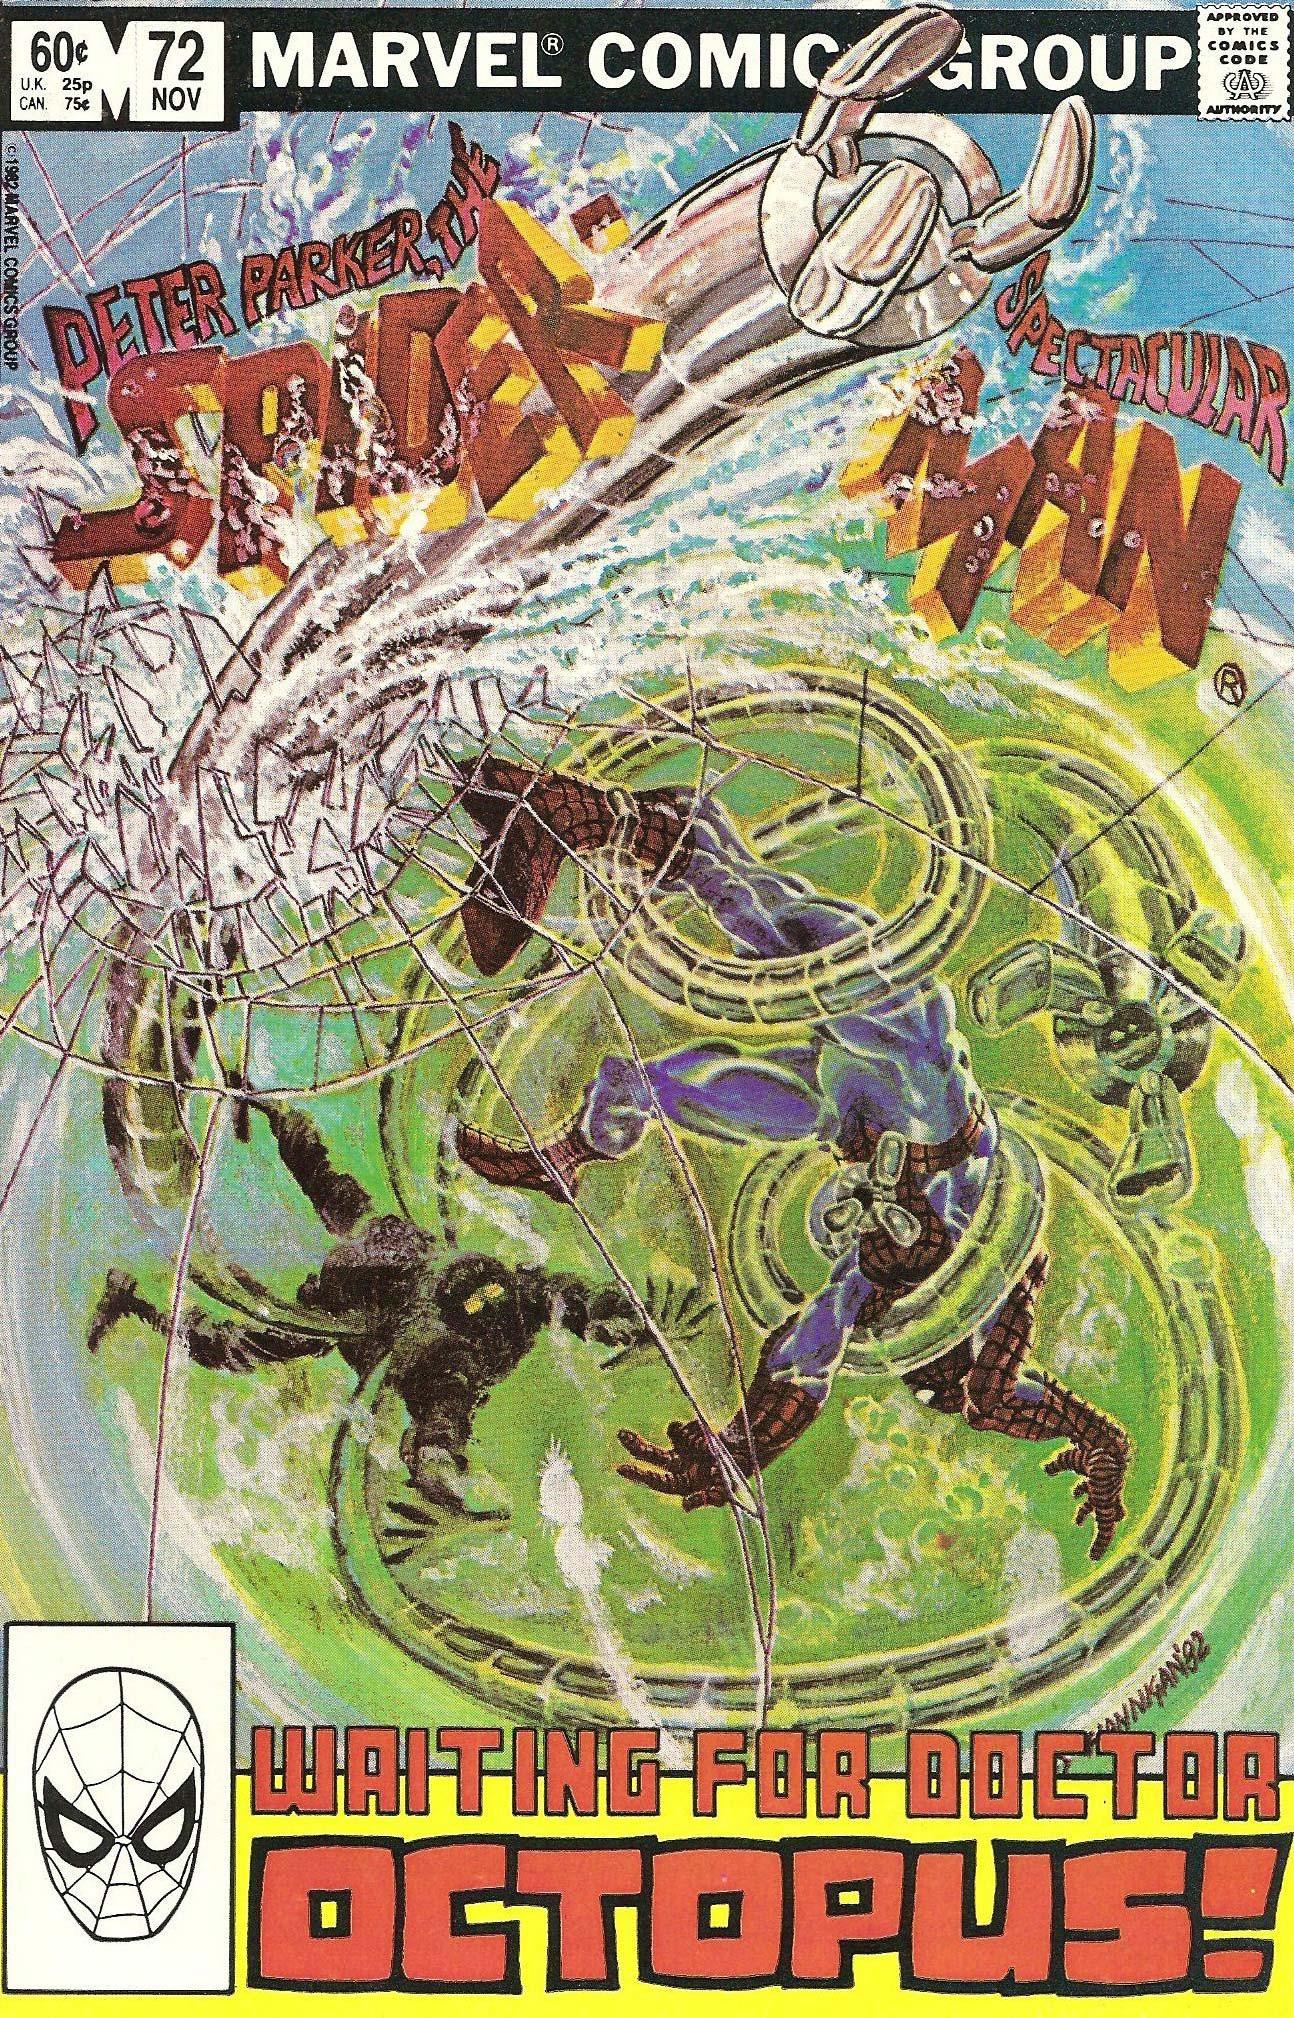 Peter Parker, the Spectacular Spider-Man (1976) #72